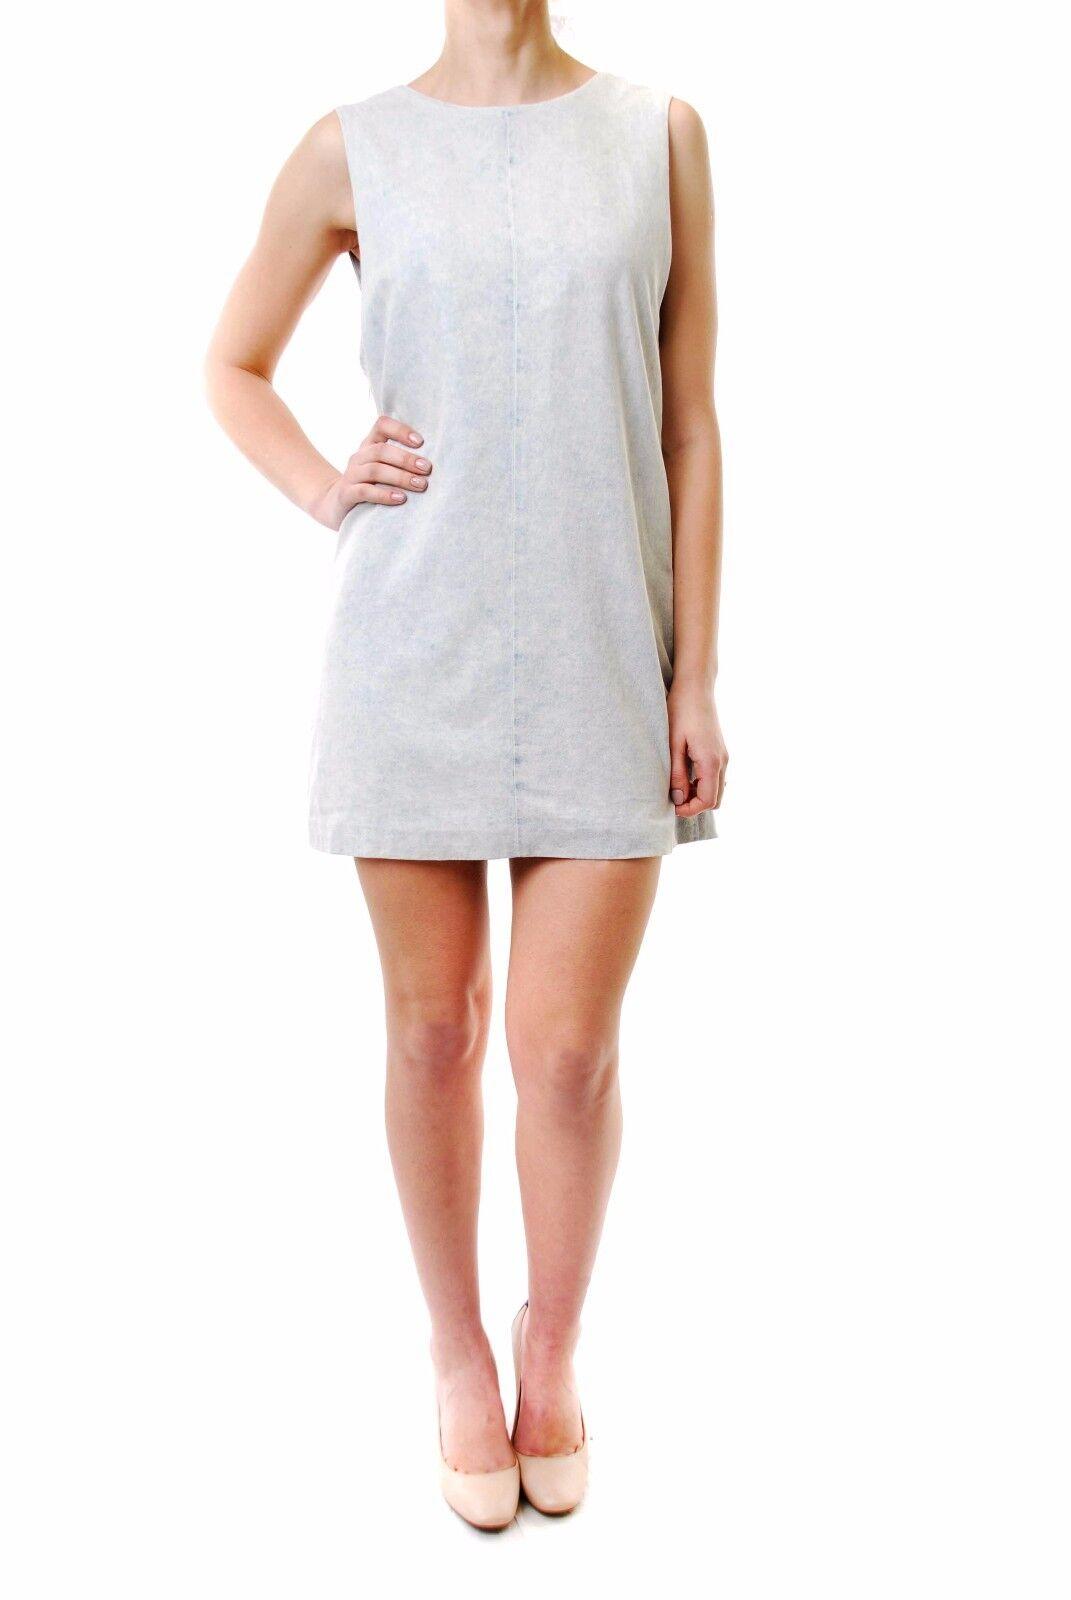 Finders Keepers Women's Lucid Dreams Dreams Dreams Dress Light bluee  Sleeveless Size S BCF64 c38e6f